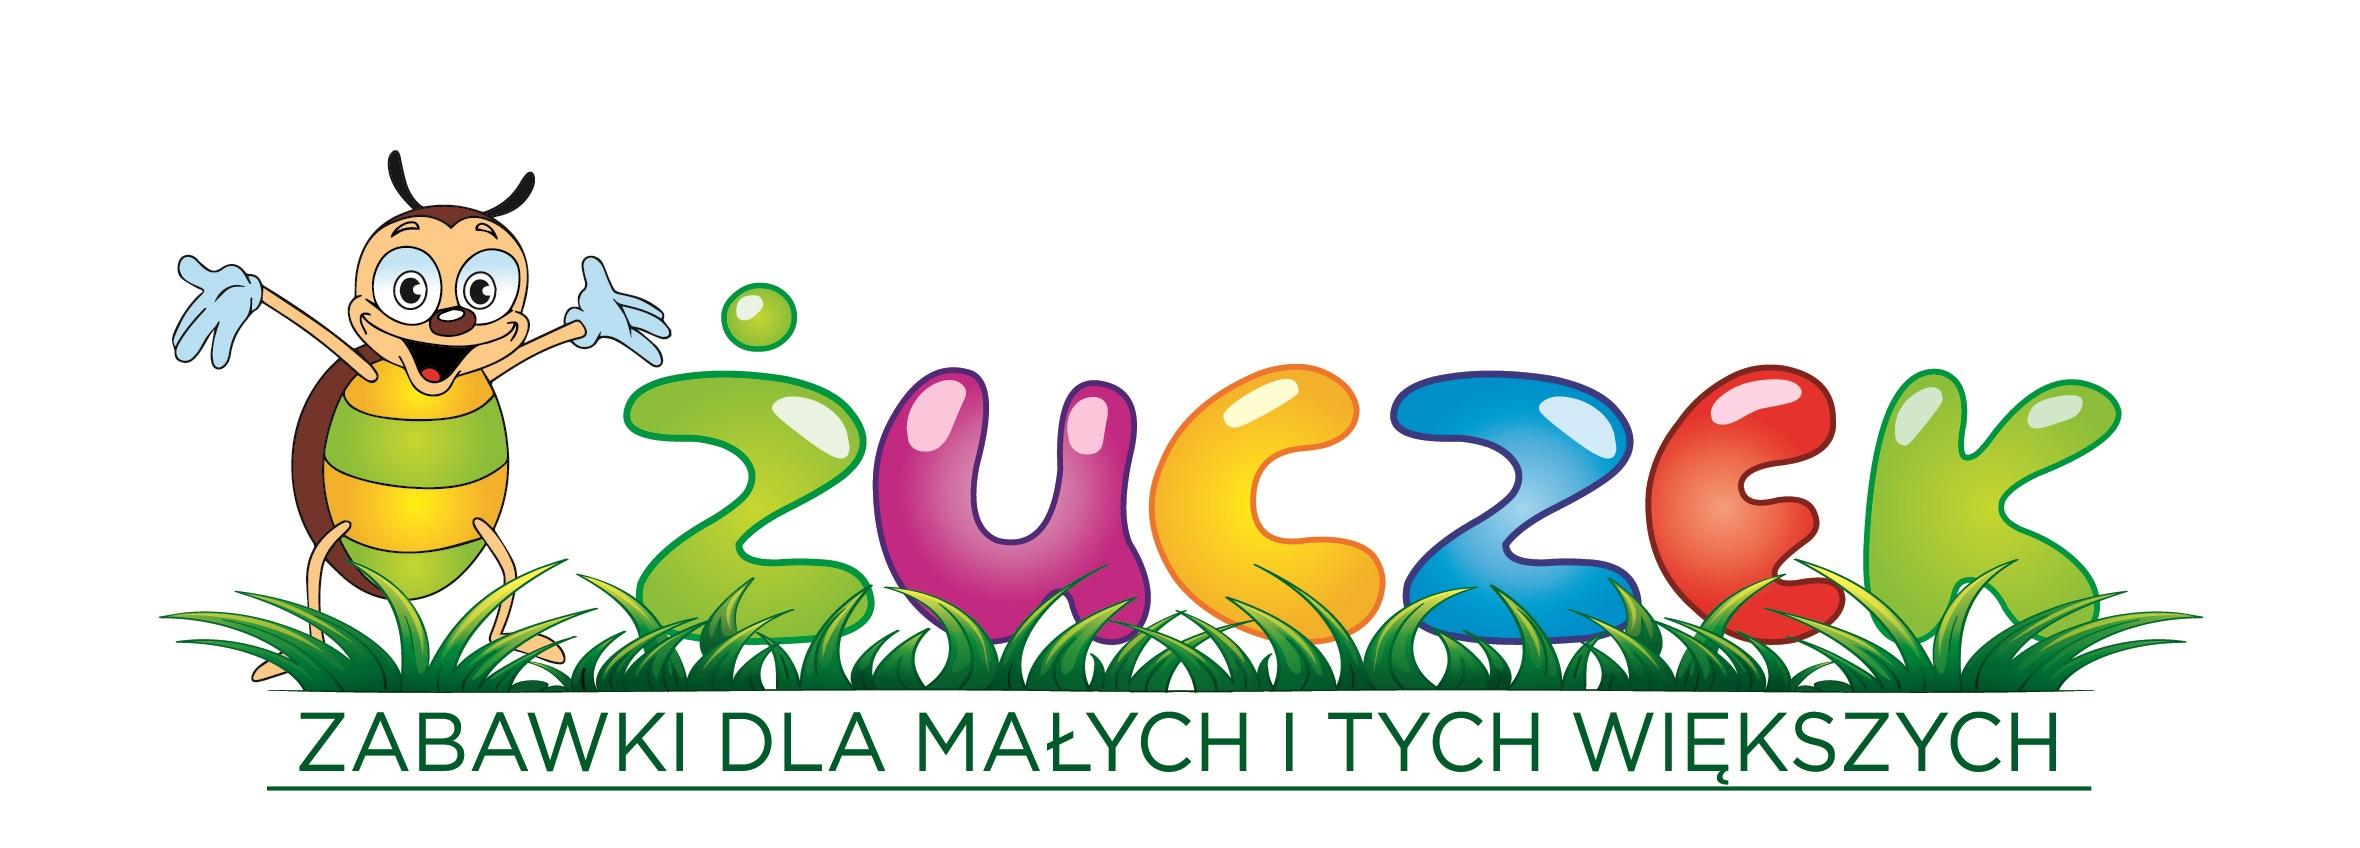 https://zuczek-zabawki.pl/wp-content/uploads/2017/07/logo.jpg